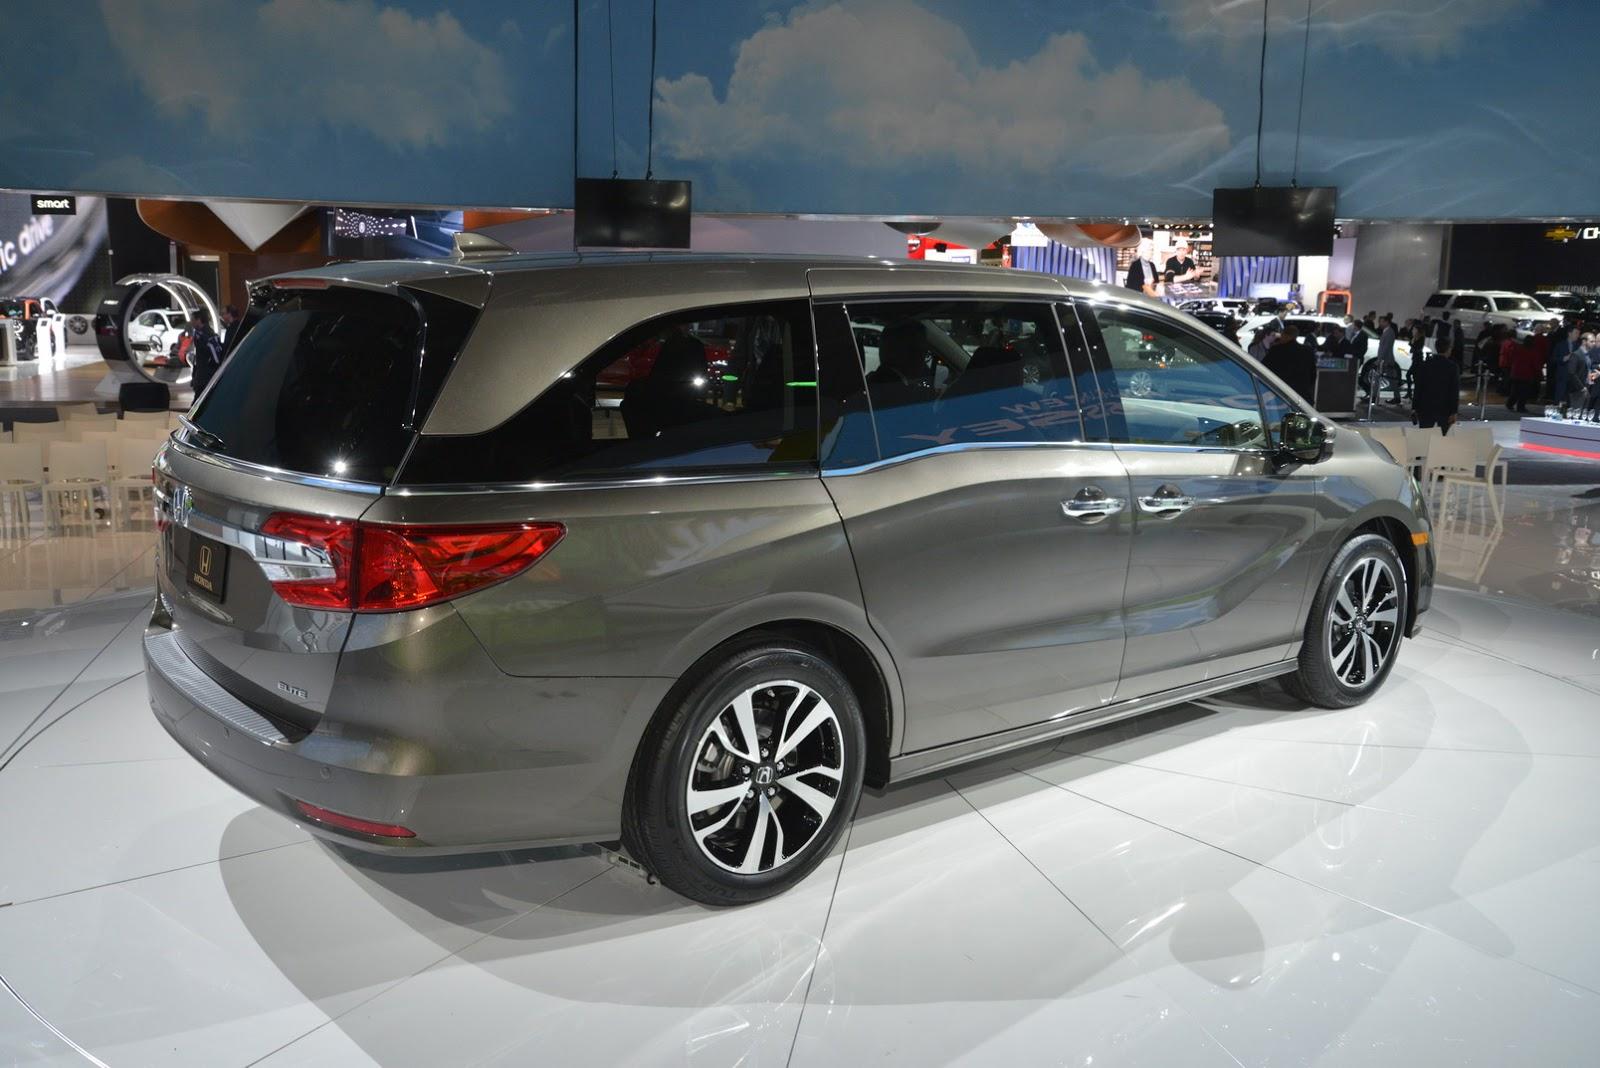 Honda Odyssey MY 2018 (Foto 8 di 67)